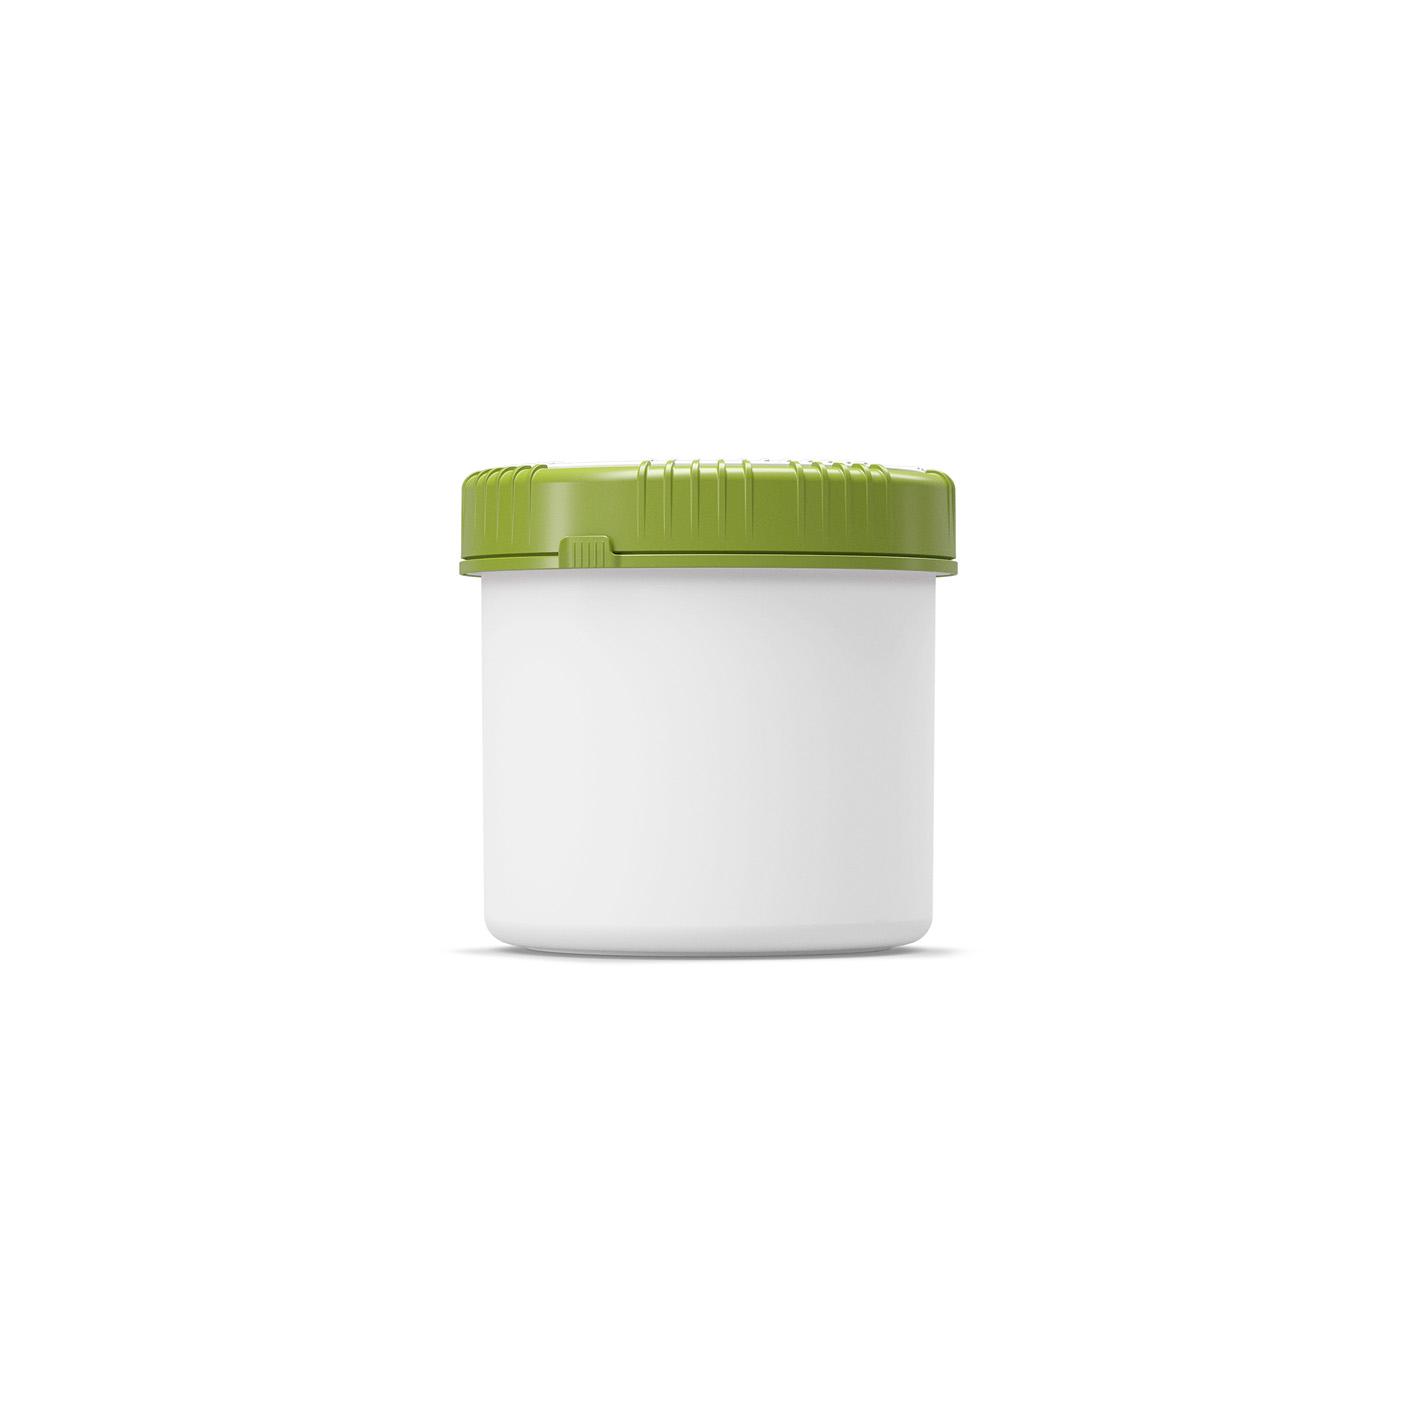 650 ml Biobased Packo